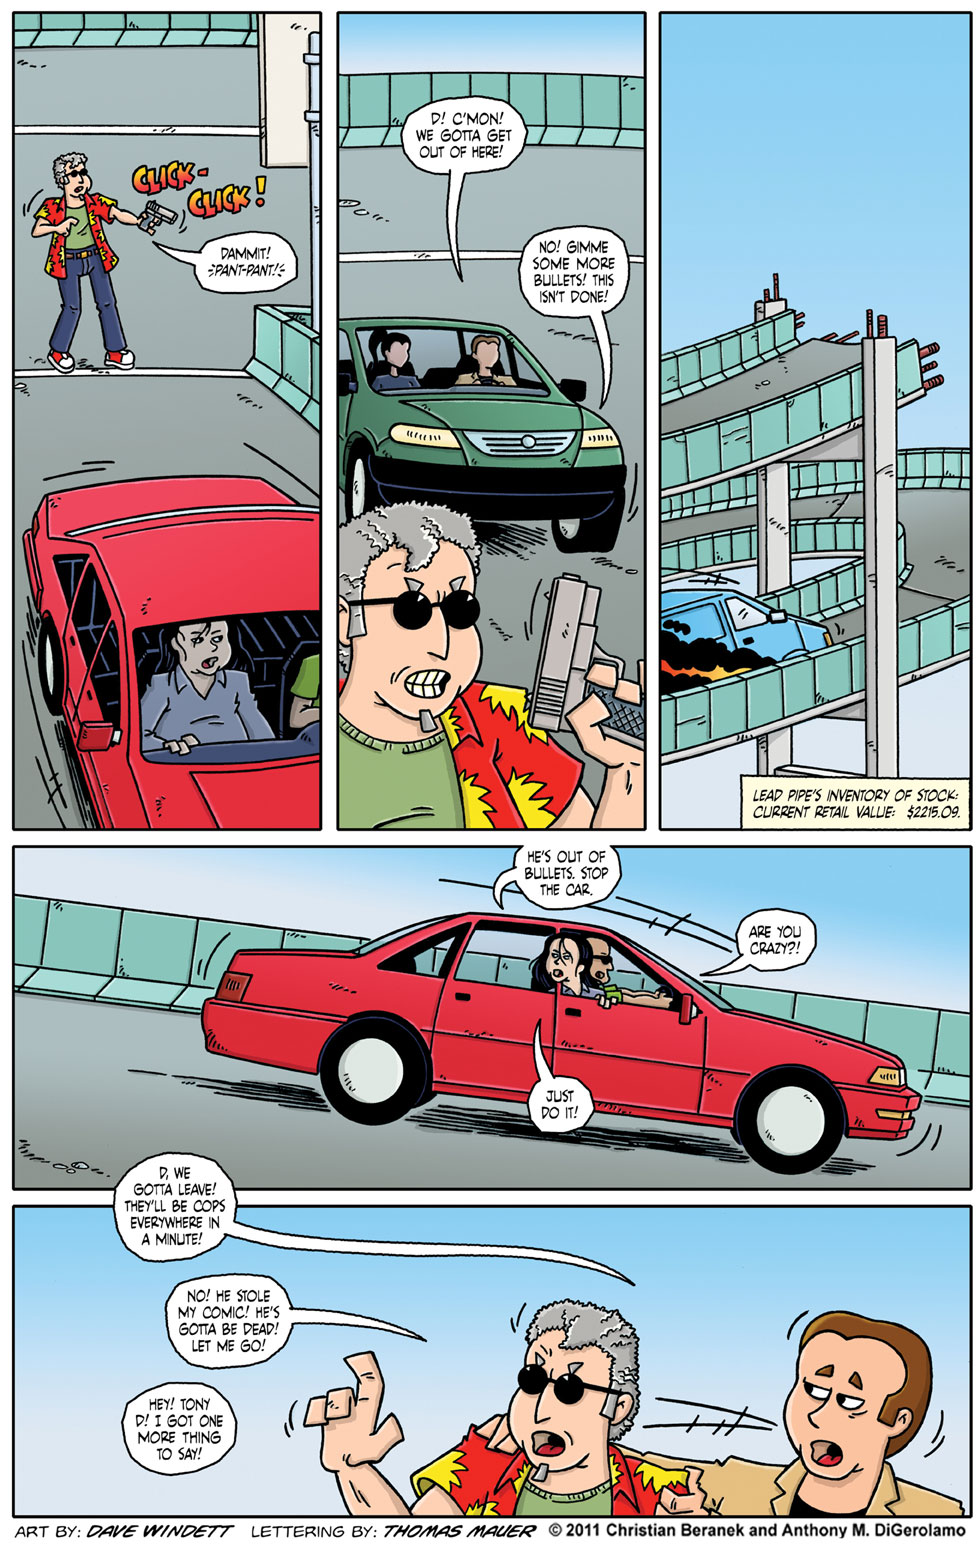 Comic Book Mafia #49:  The Fleeing Comic Stealer